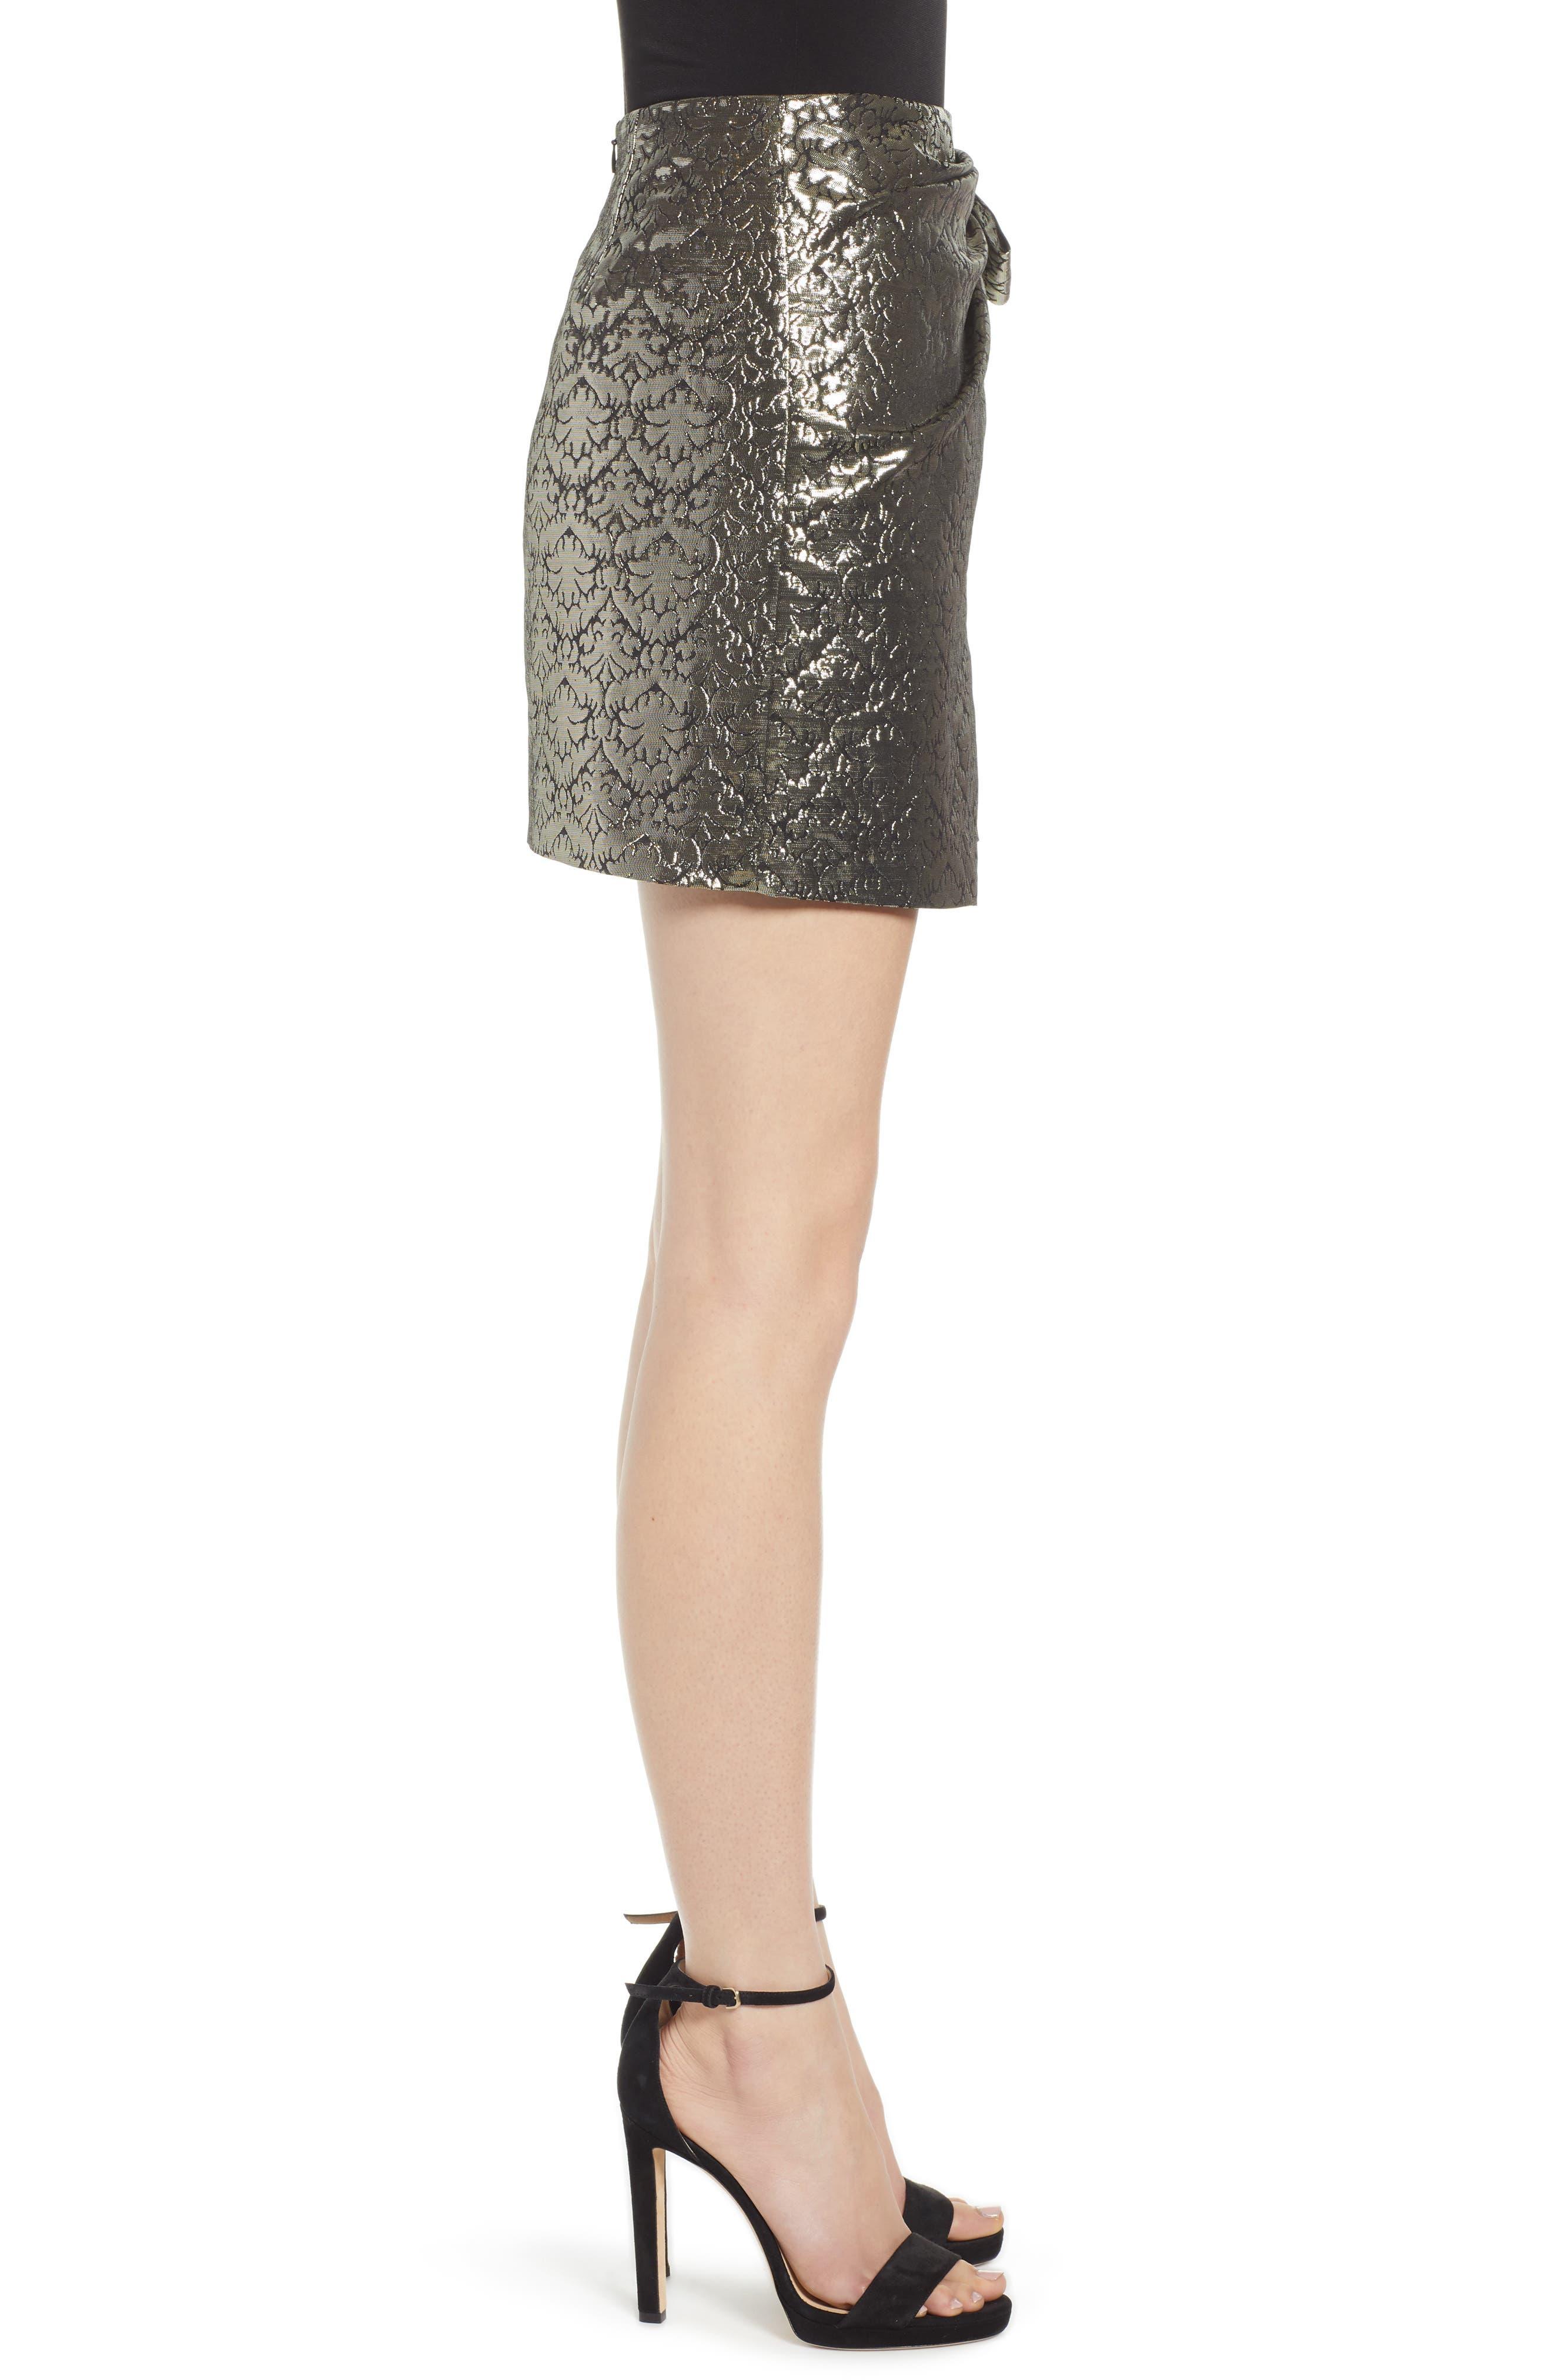 REBECCA MINKOFF, Augustina Shimmering Jacquard Faux Wrap Skirt, Alternate thumbnail 3, color, 710